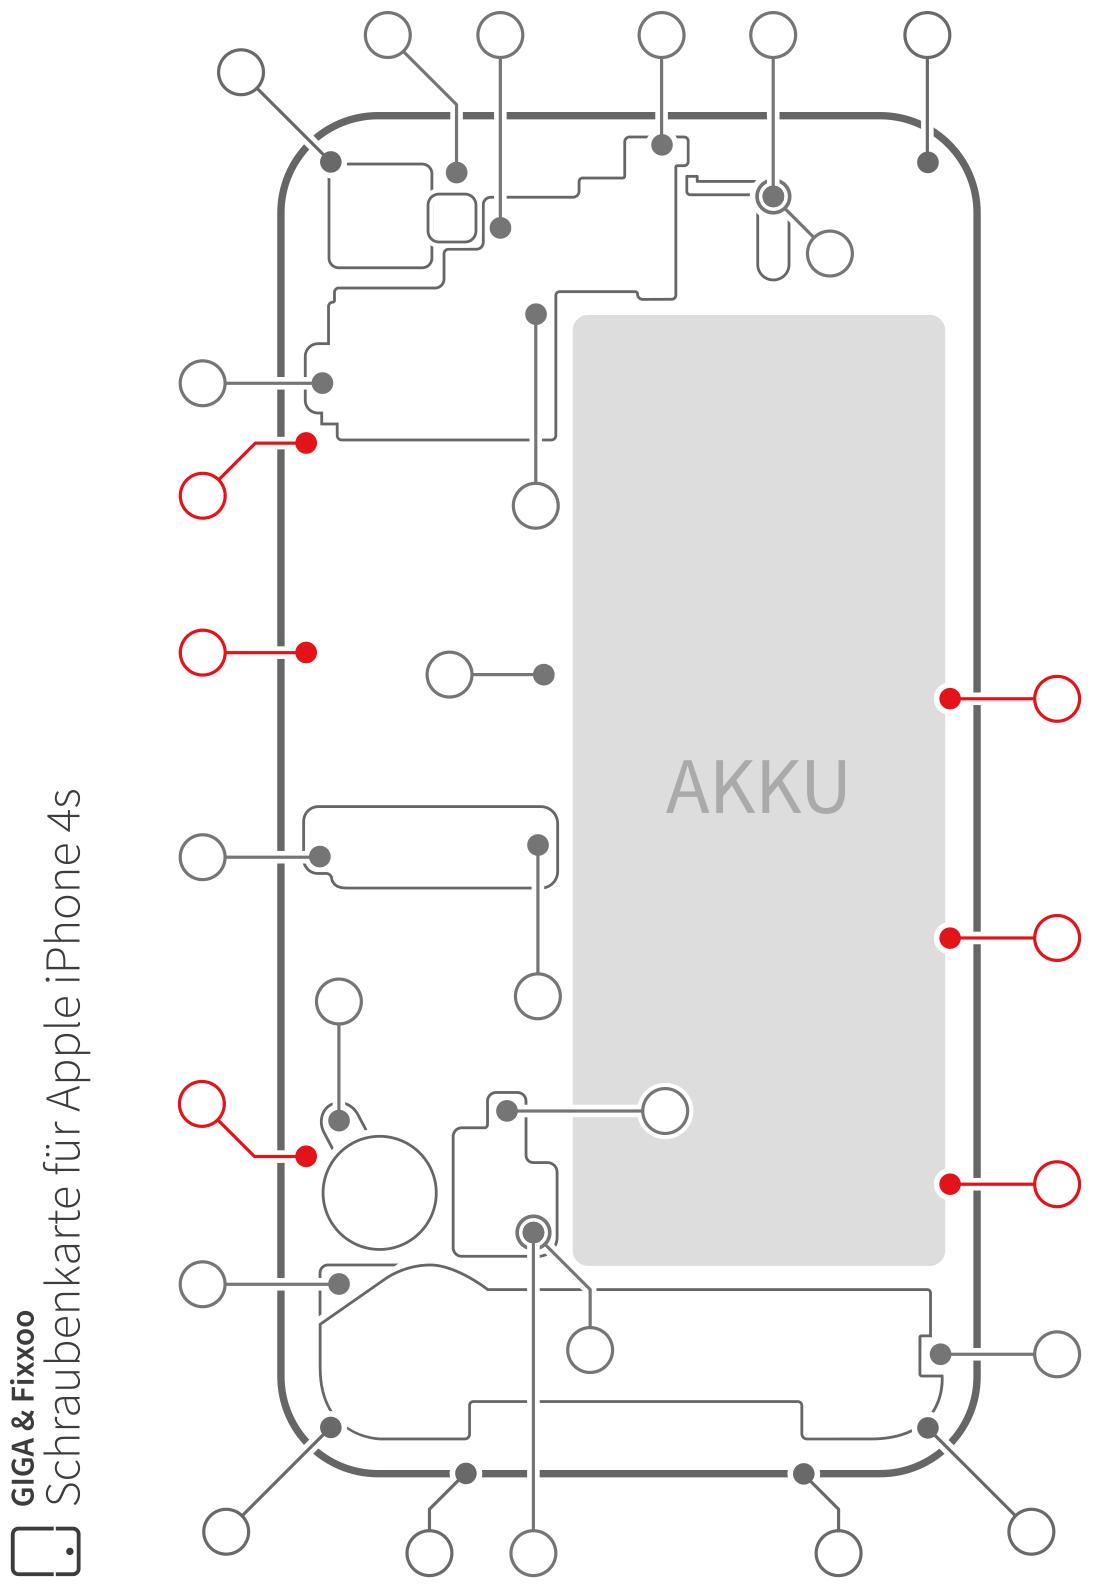 iphone 4s display reparatur anleitung und faq troubleshooting giga. Black Bedroom Furniture Sets. Home Design Ideas